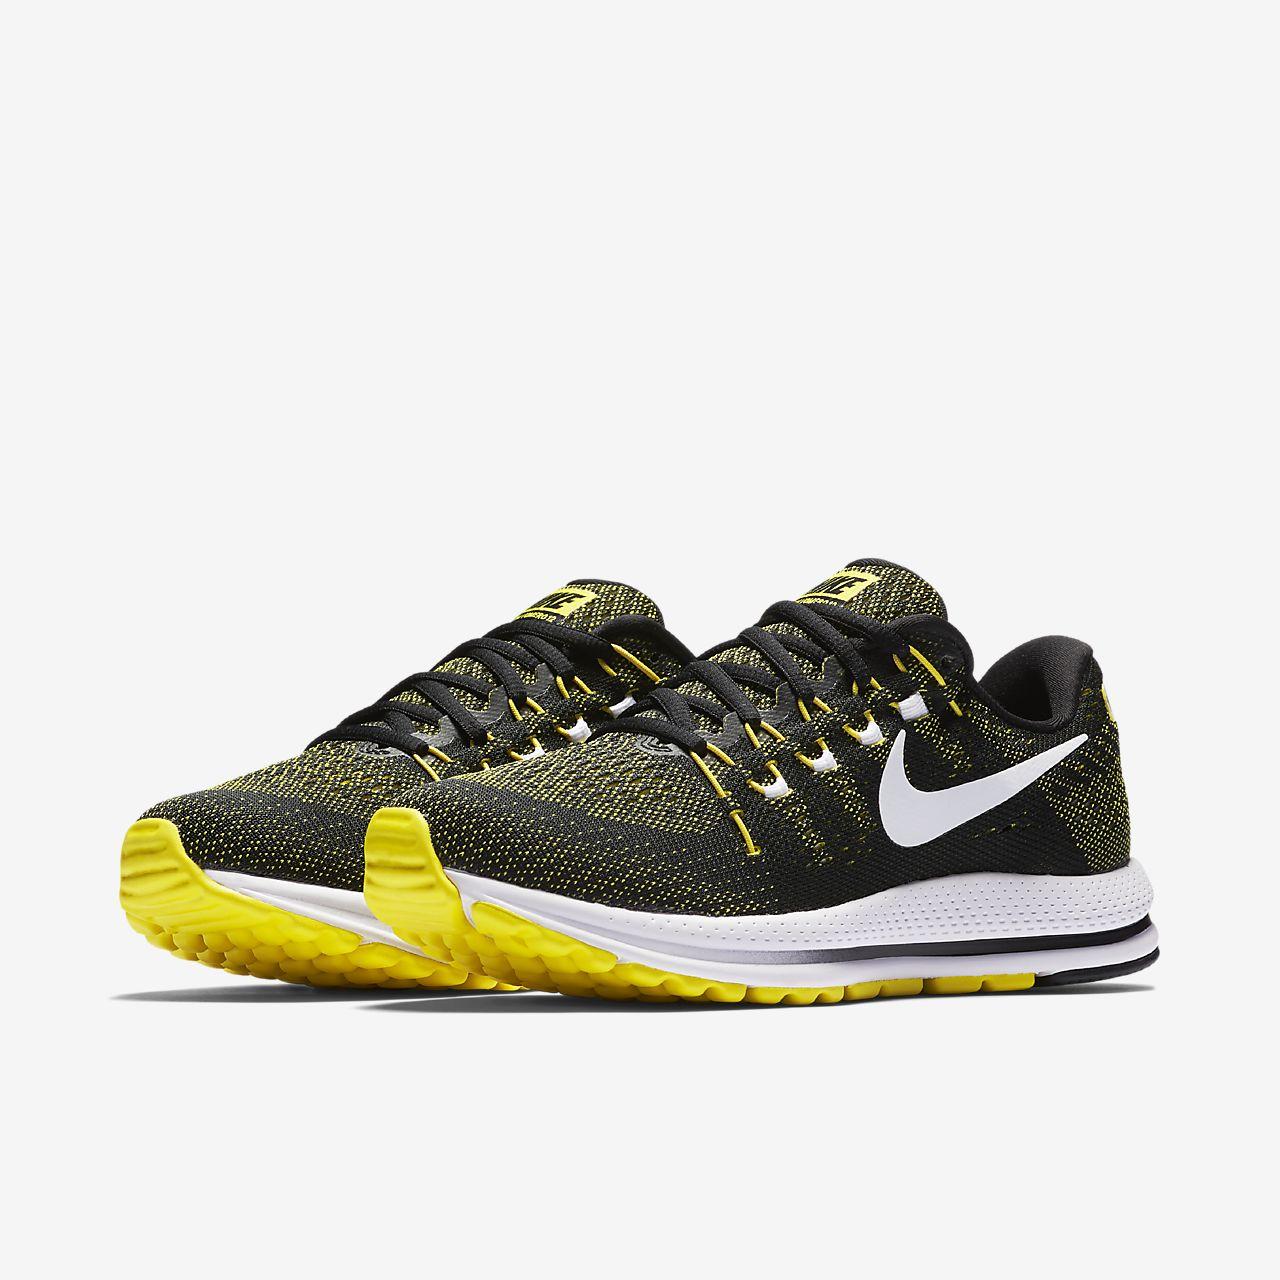 Nike Wmns Nike Air Zoom Vomero 12 Noir cVt23zL